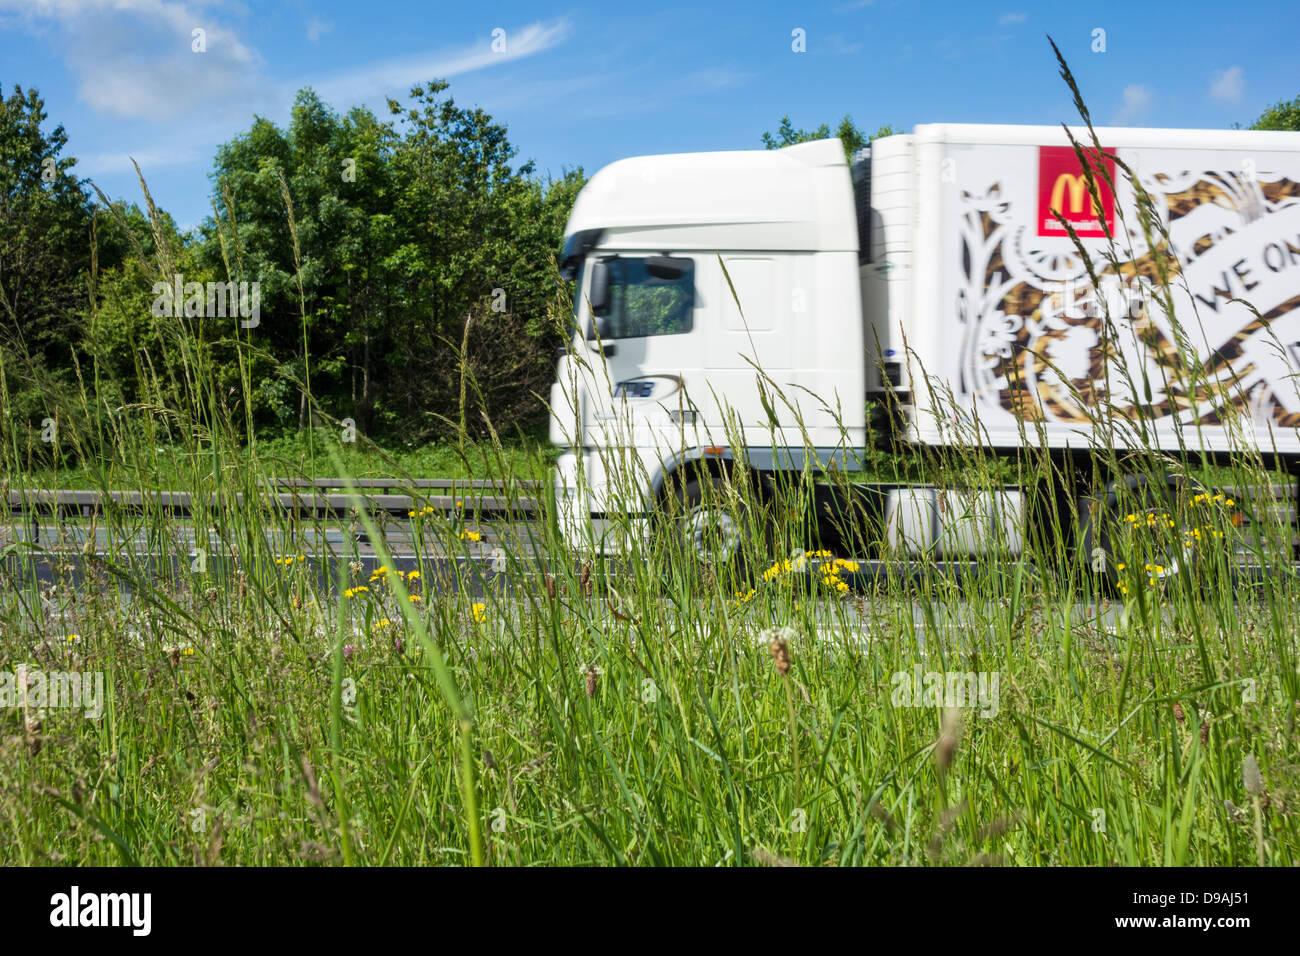 Uncut grass and wildflowers on Motorway grass verge. UK - Stock Image